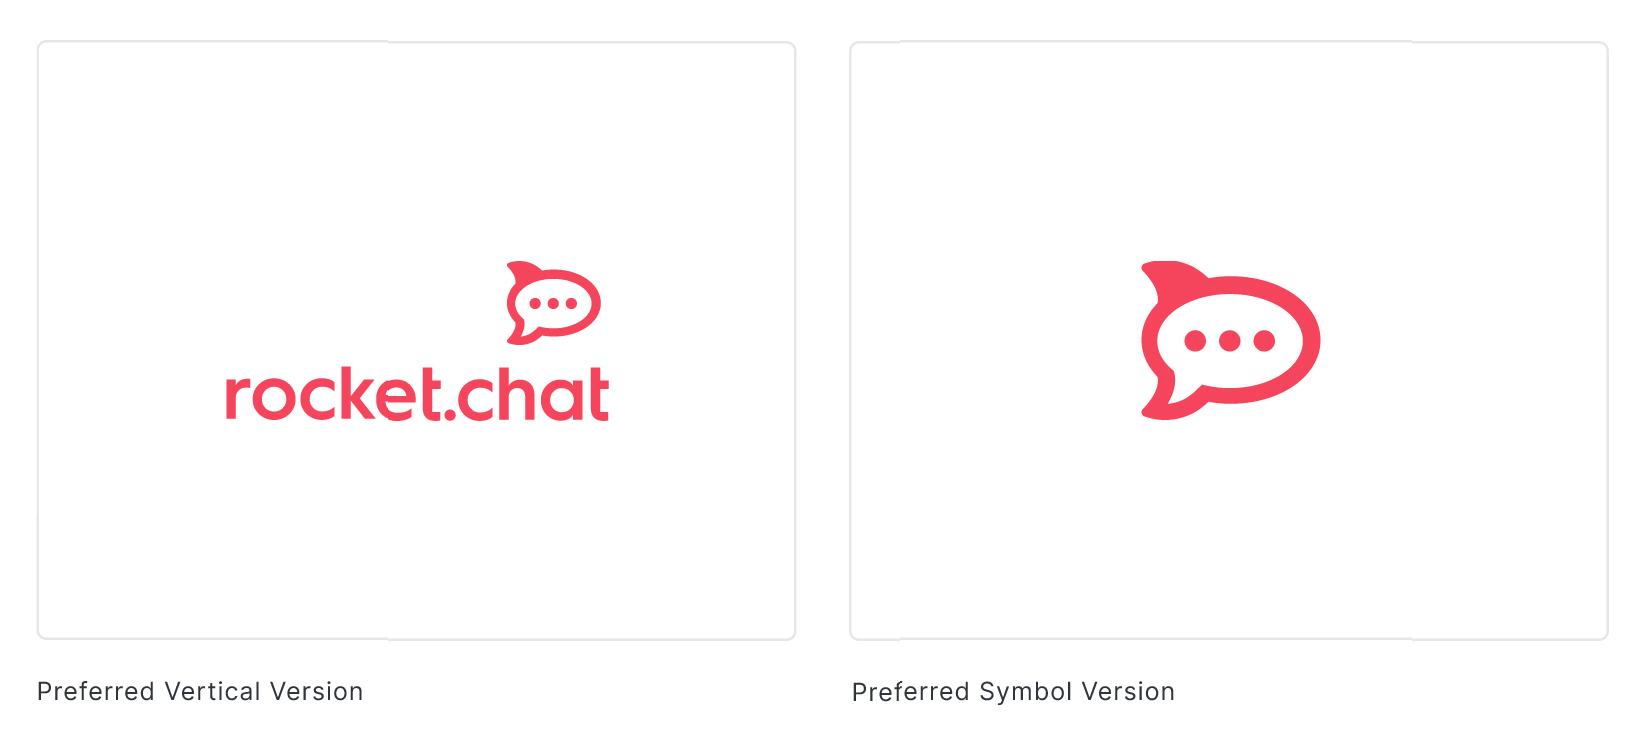 .gitbook/assets/02_logo.jpg